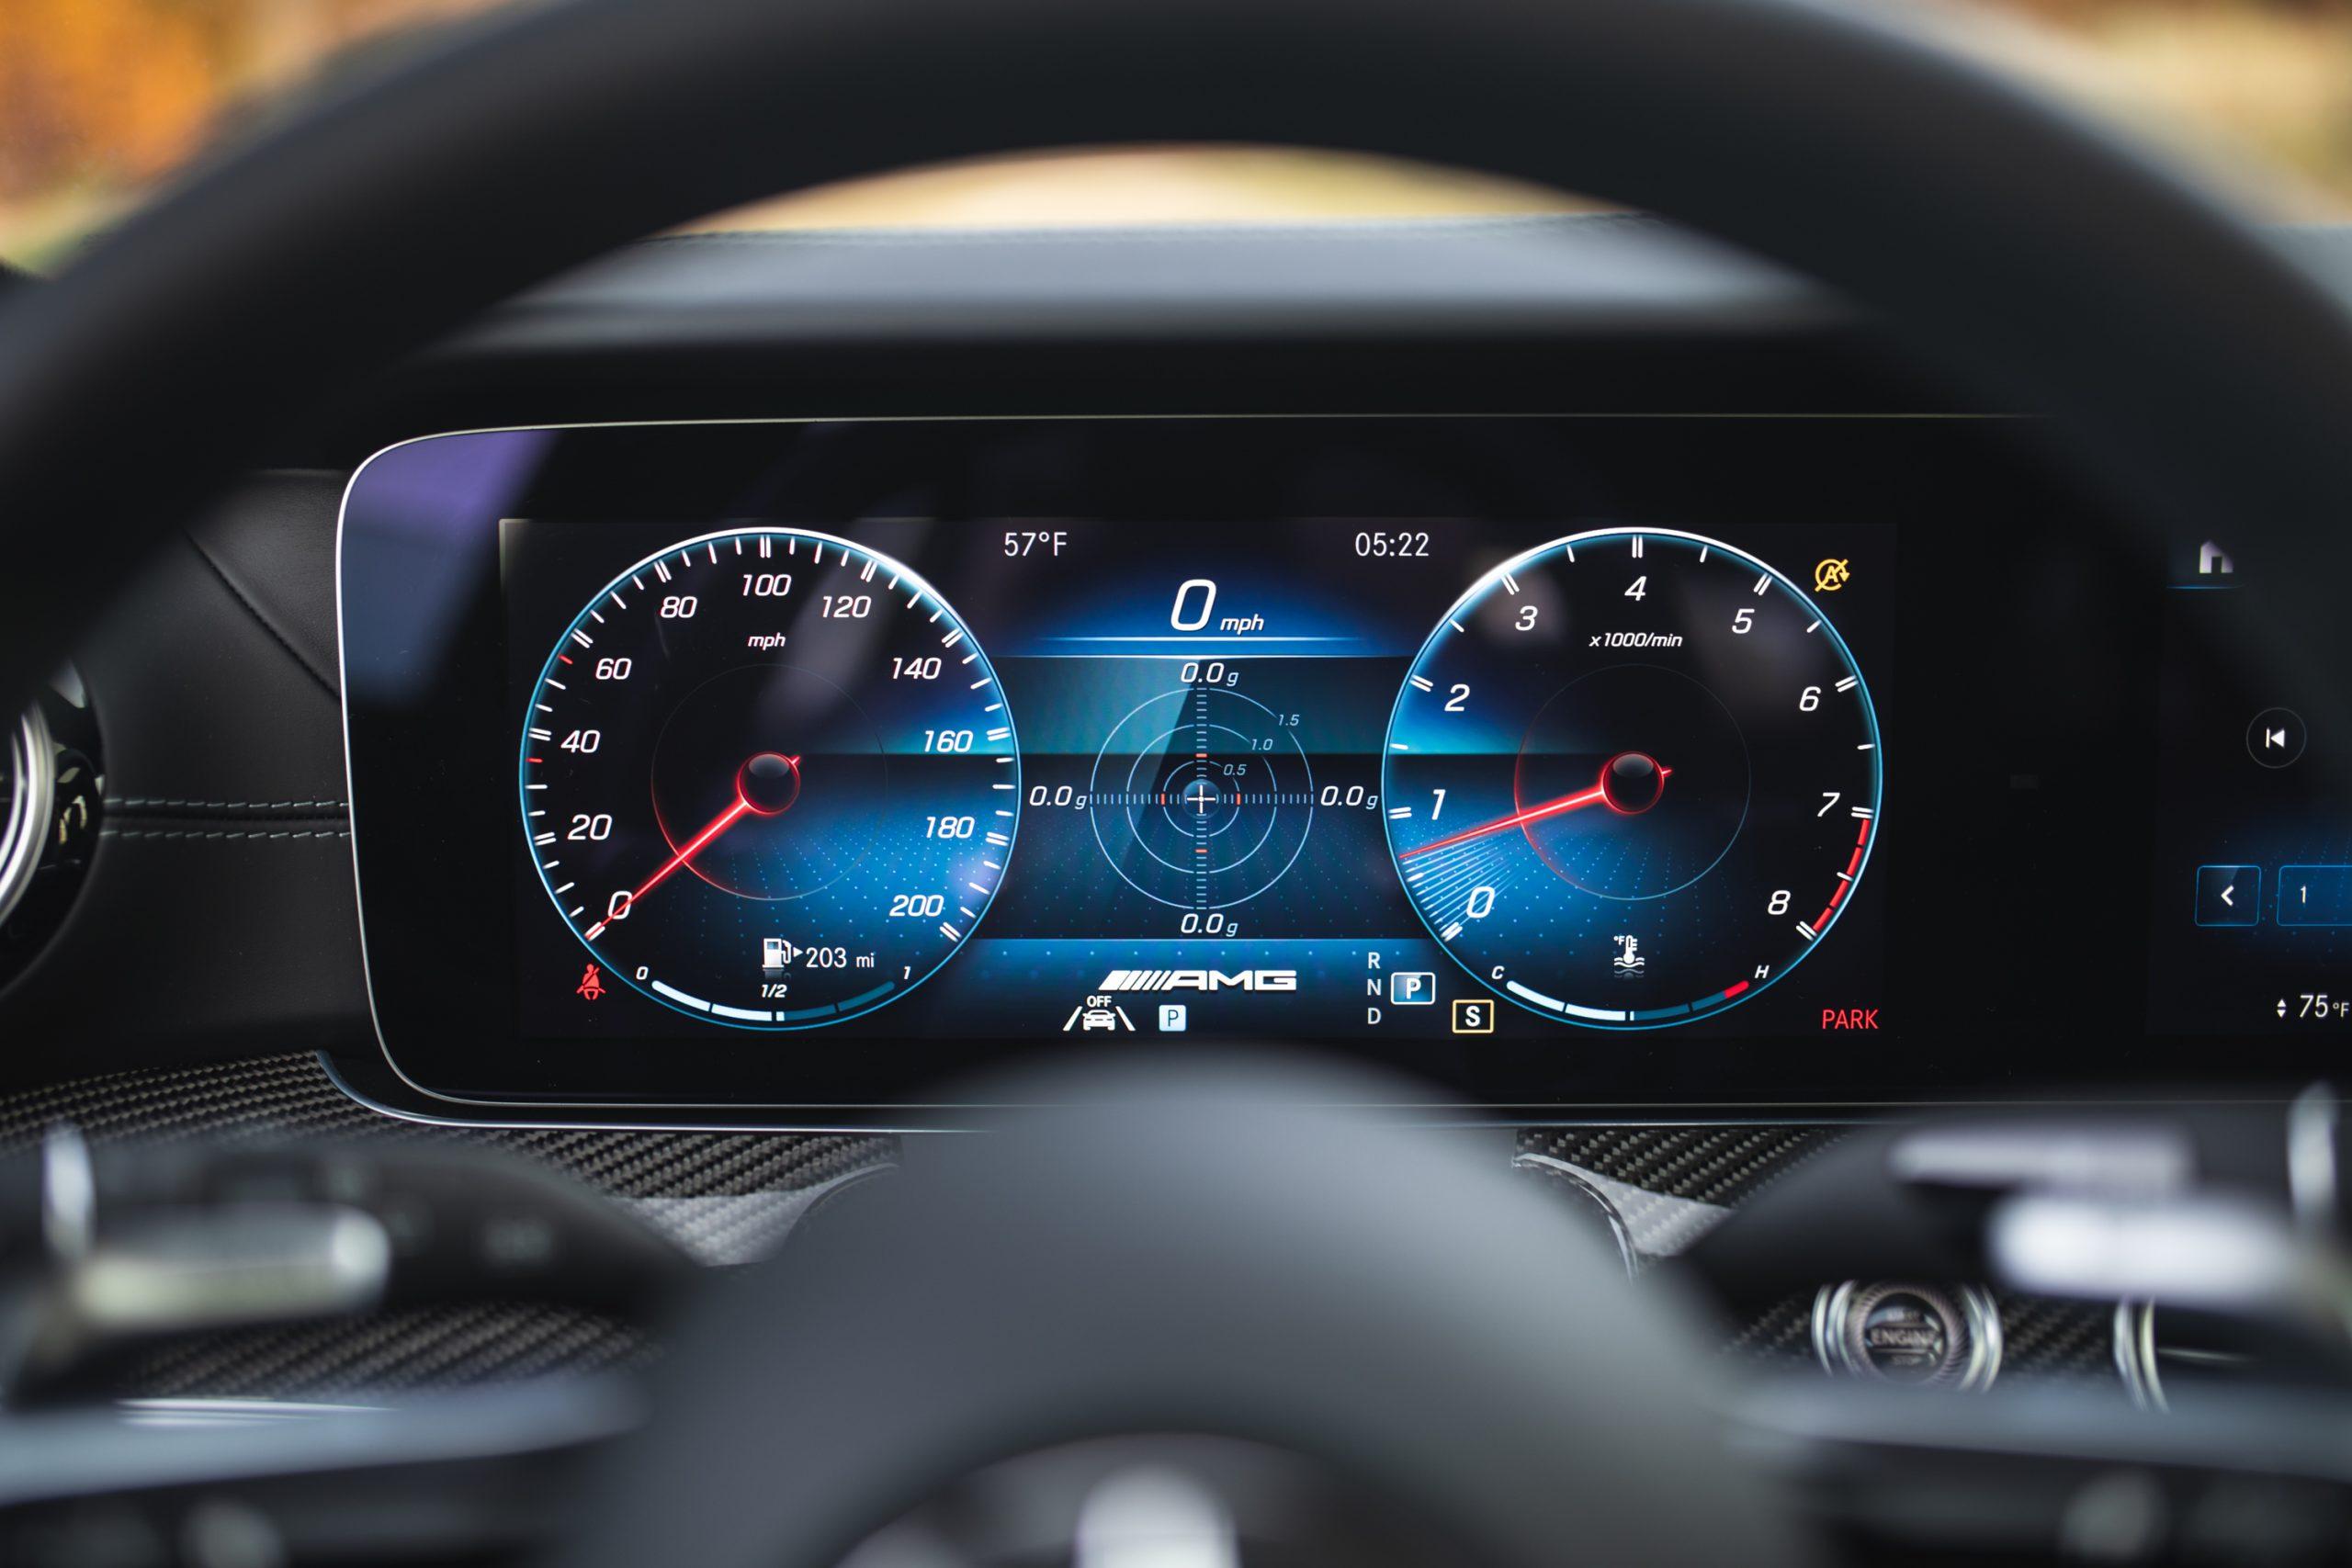 2021 Mercedes-AMG E63 S interior digital gauges